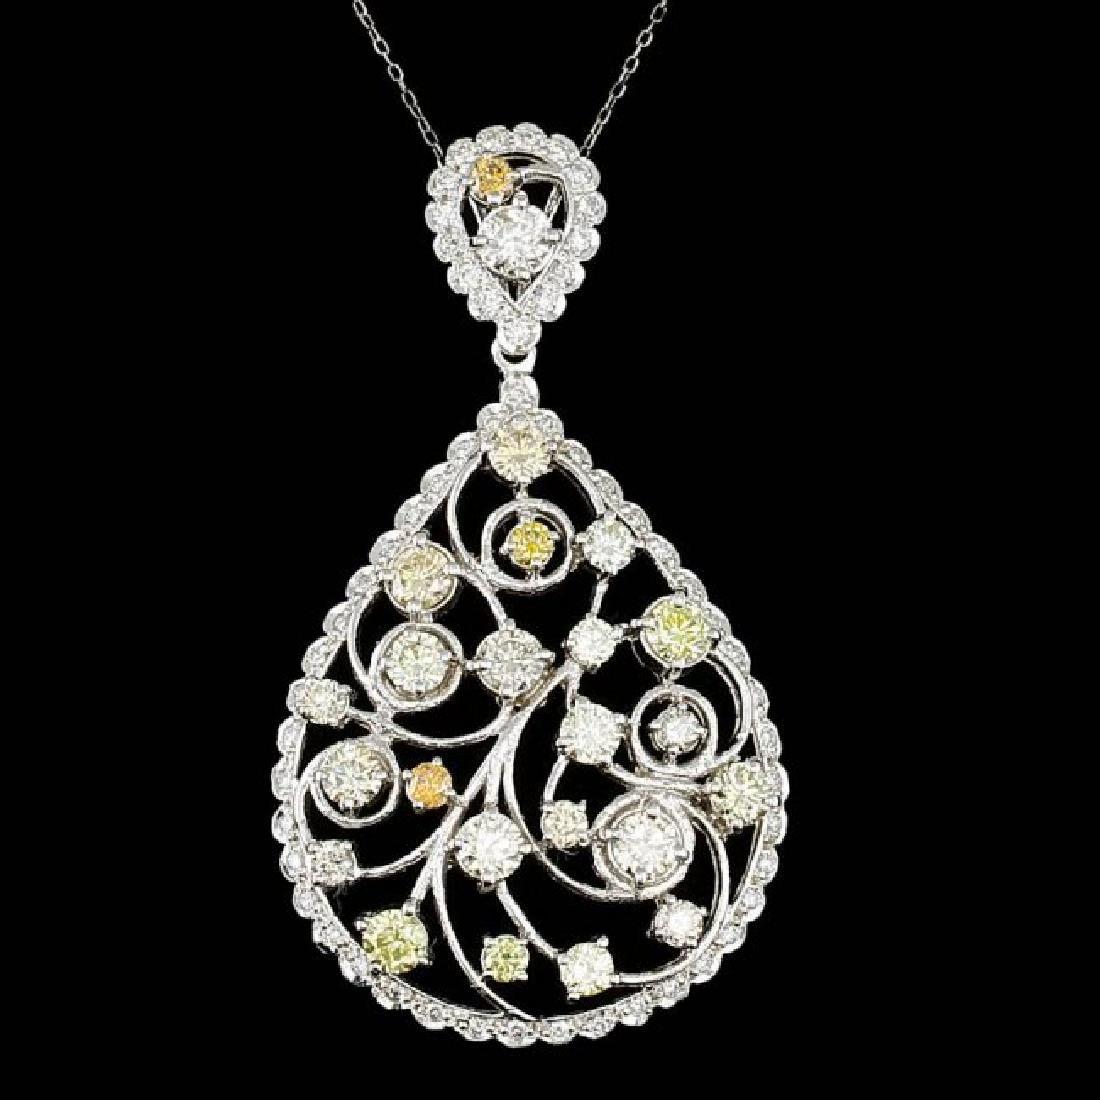 14k White Gold 6.85ct Diamond Pendant